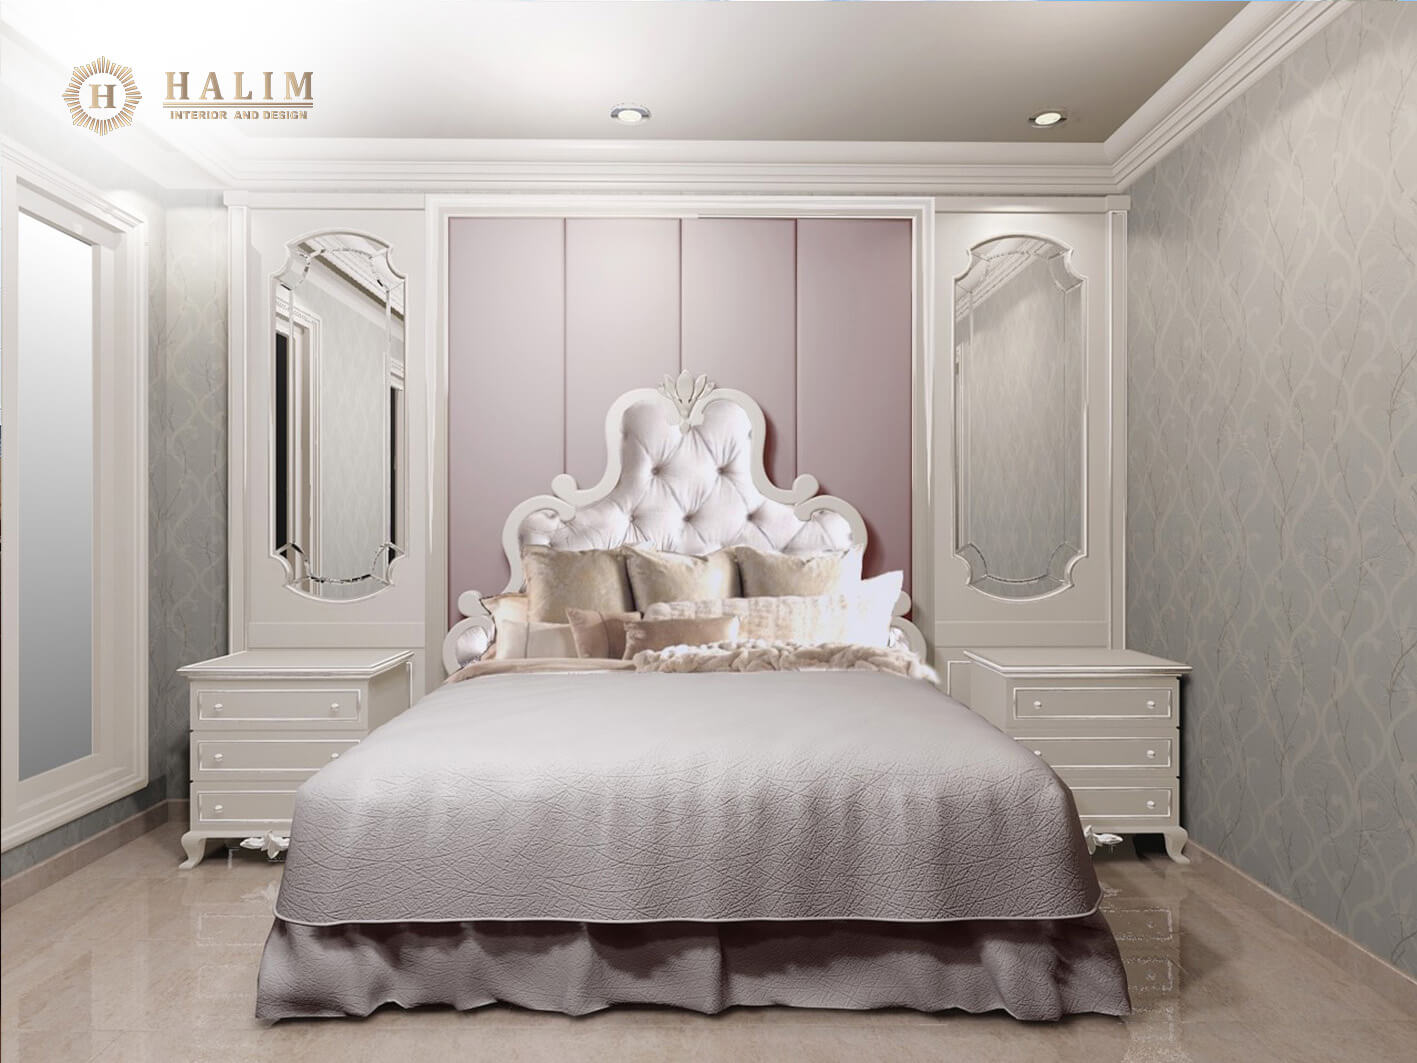 Halim, Interior, modern, furniture, contemporer american style, minimalist, european, classic, surabaya, 1 Pakuwon City